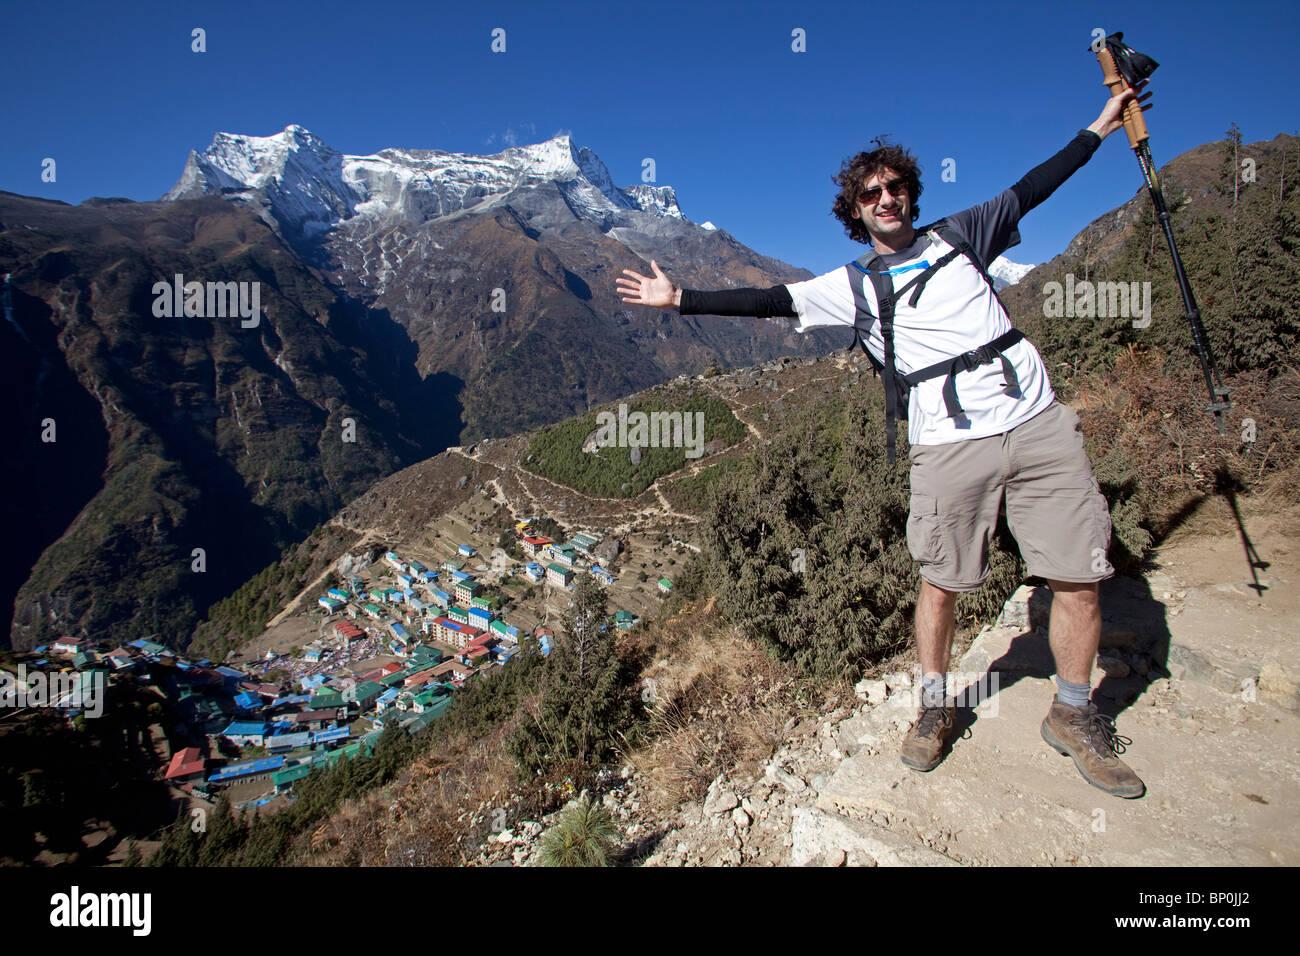 Nepal, Everest Region, Namche Bazaar, Khumbu Valley. Trekkers on the Everest Base Camp trail looking back over Namche - Stock Image